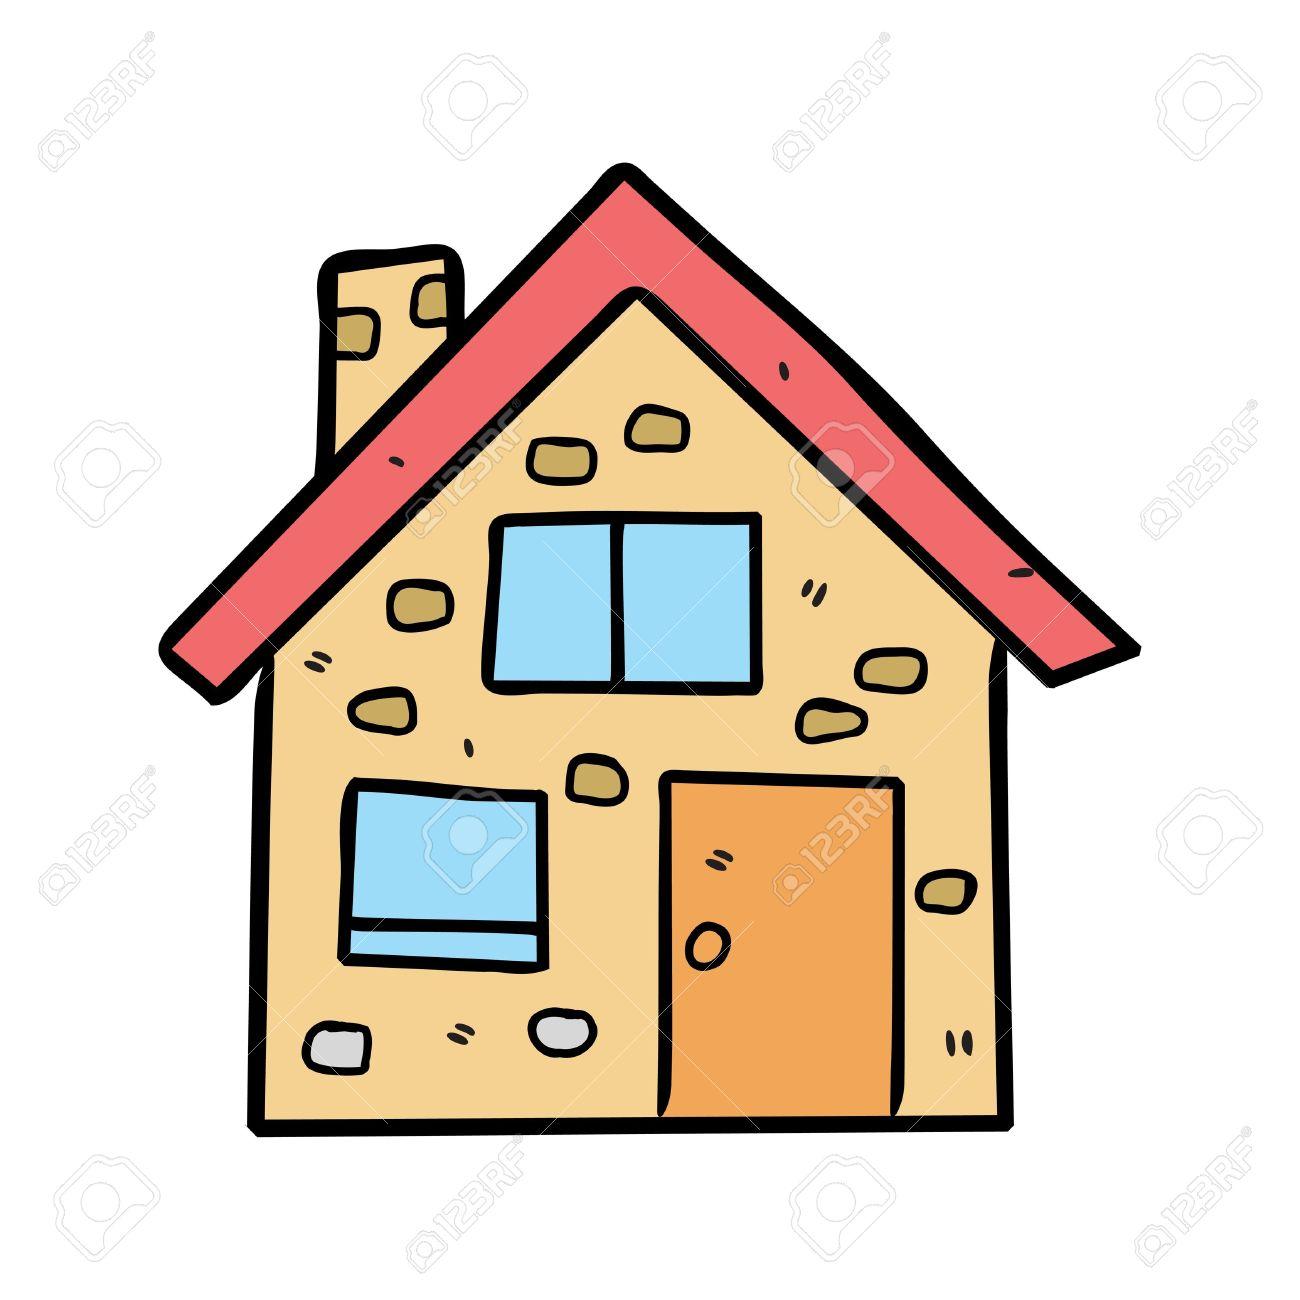 Bungalow Home Clipart - Clipart Kid